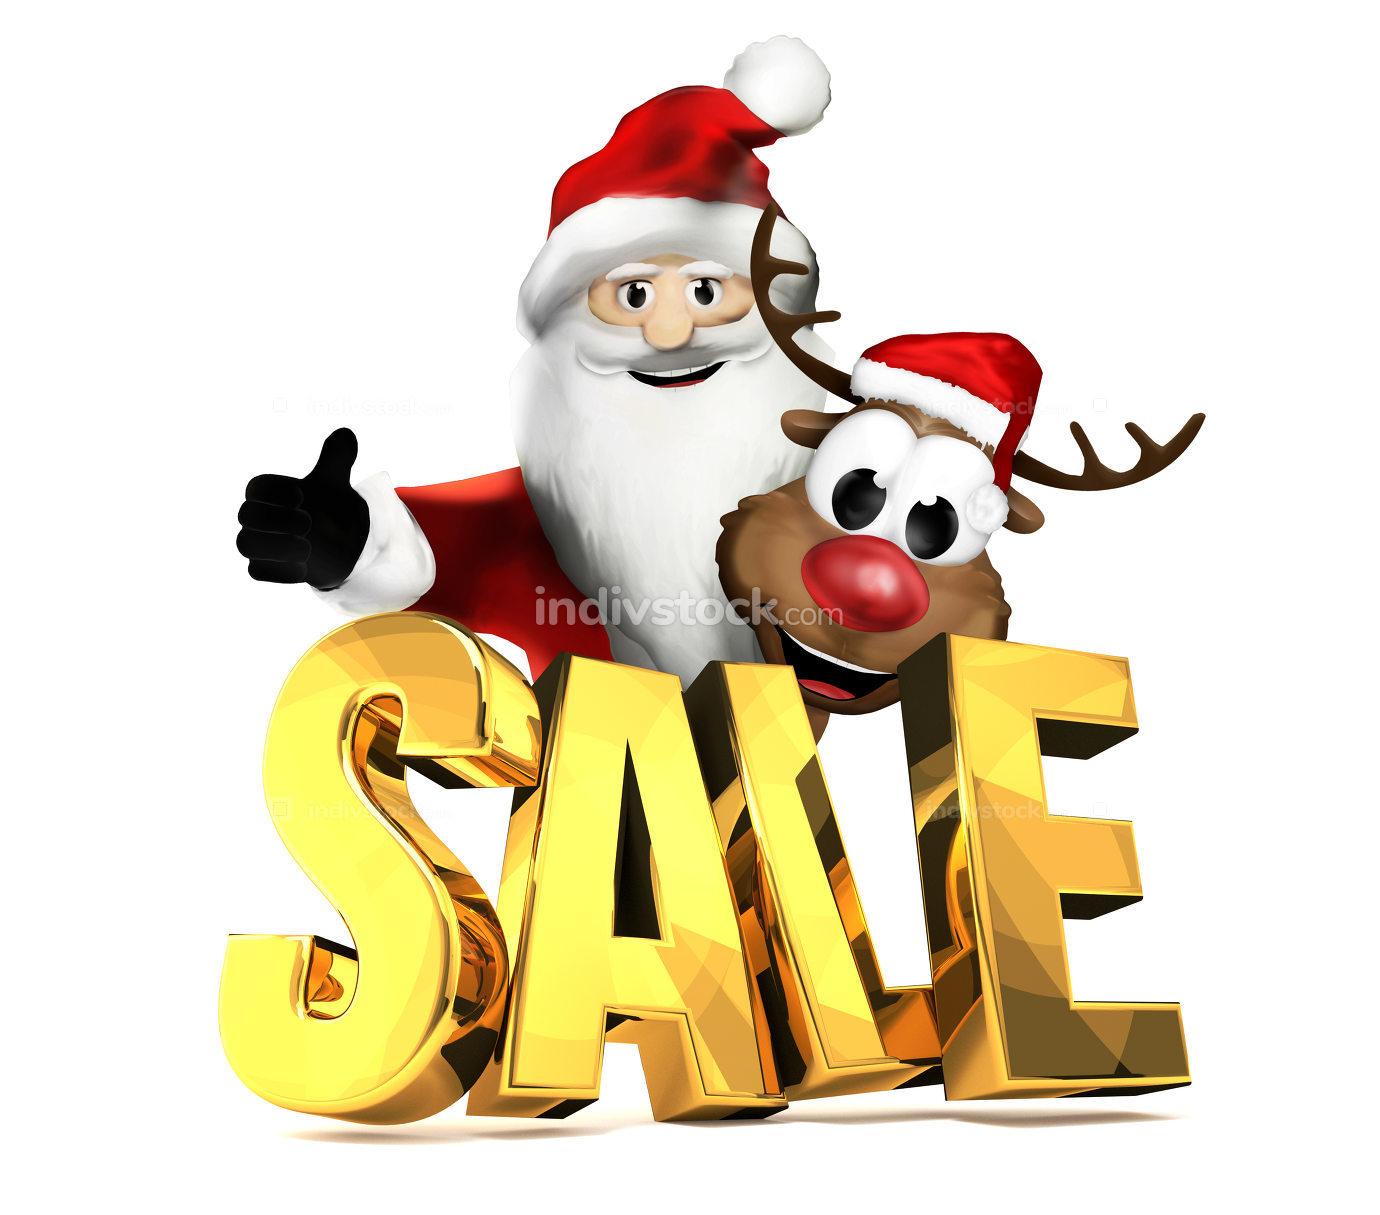 Santa Claus and Reindeer christmas sale golden 3d rendering